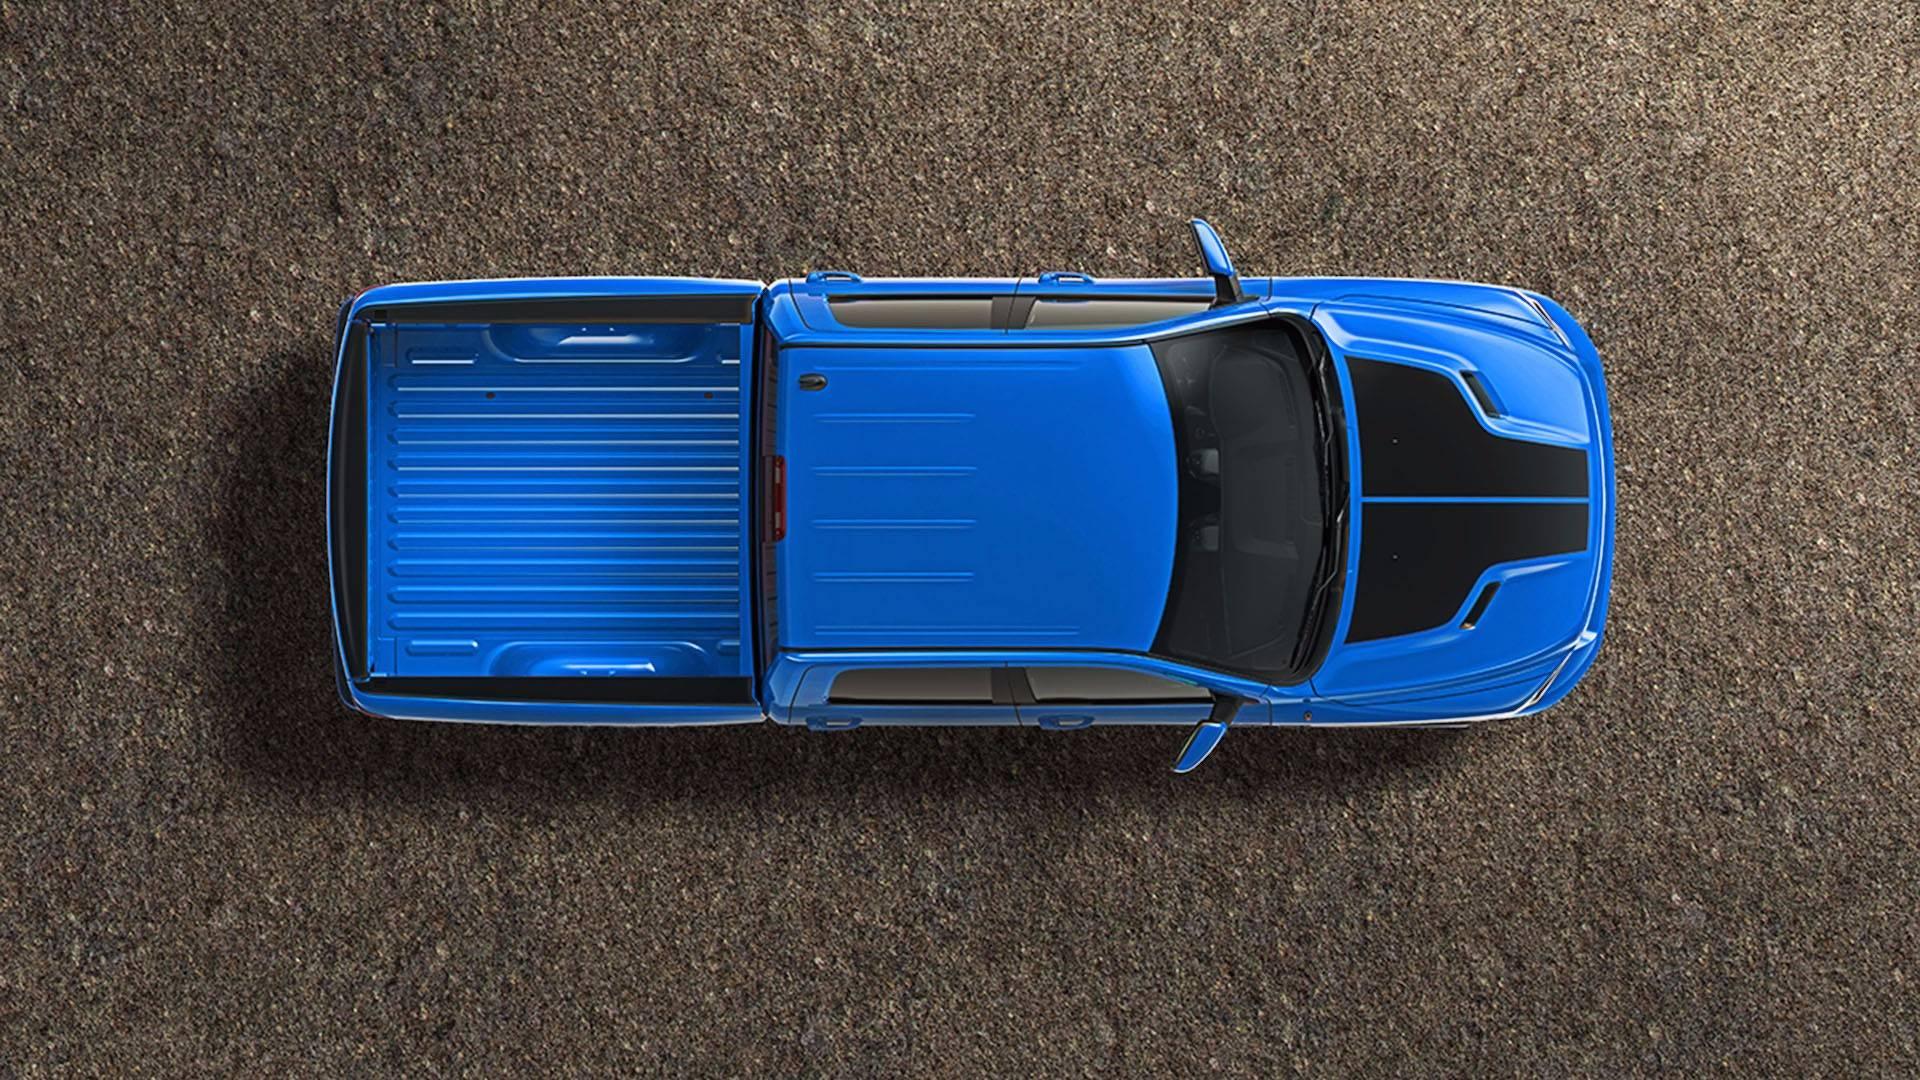 2018-ram-1500-hydro-blue-sport